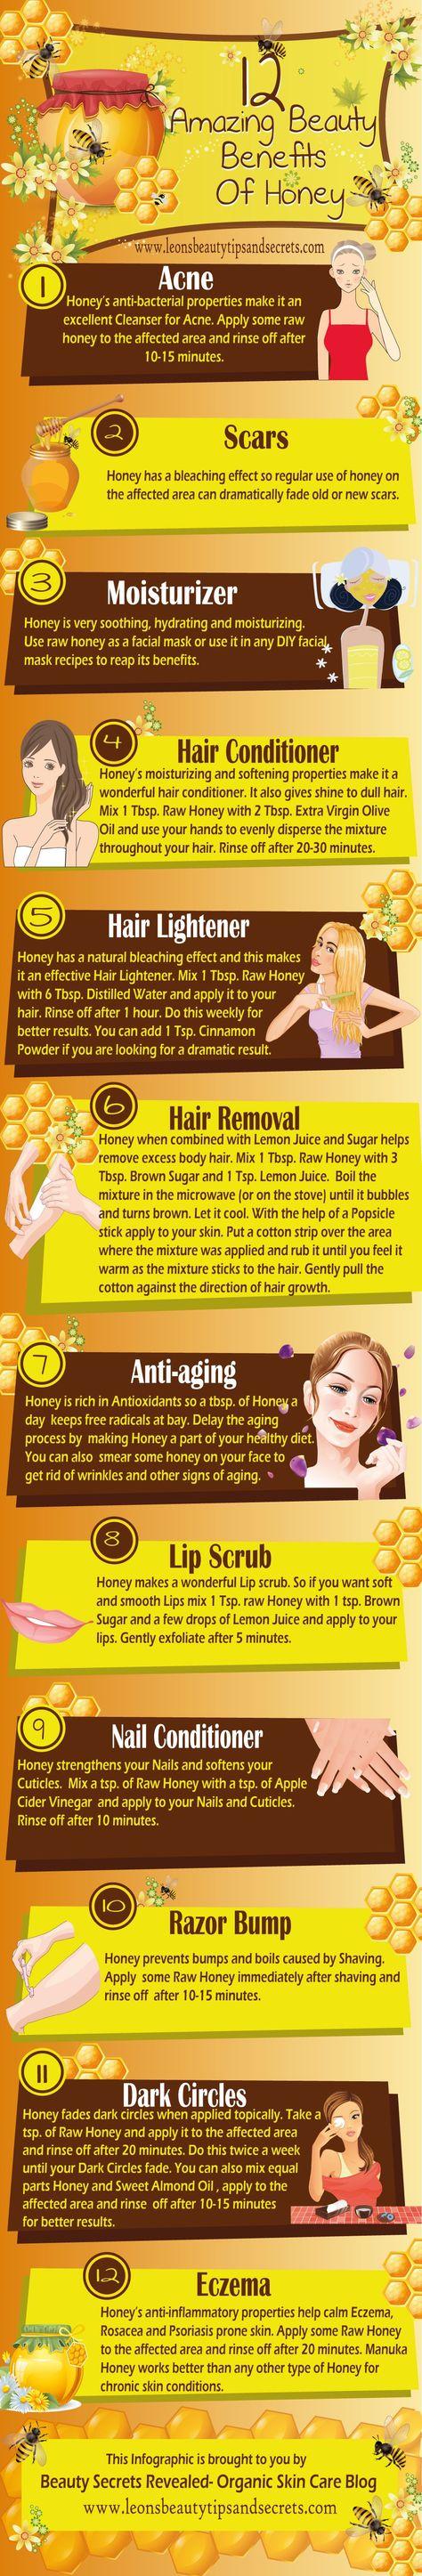 12 Amazing Beauty Benefits Of Honey #infographic #naturalremedies